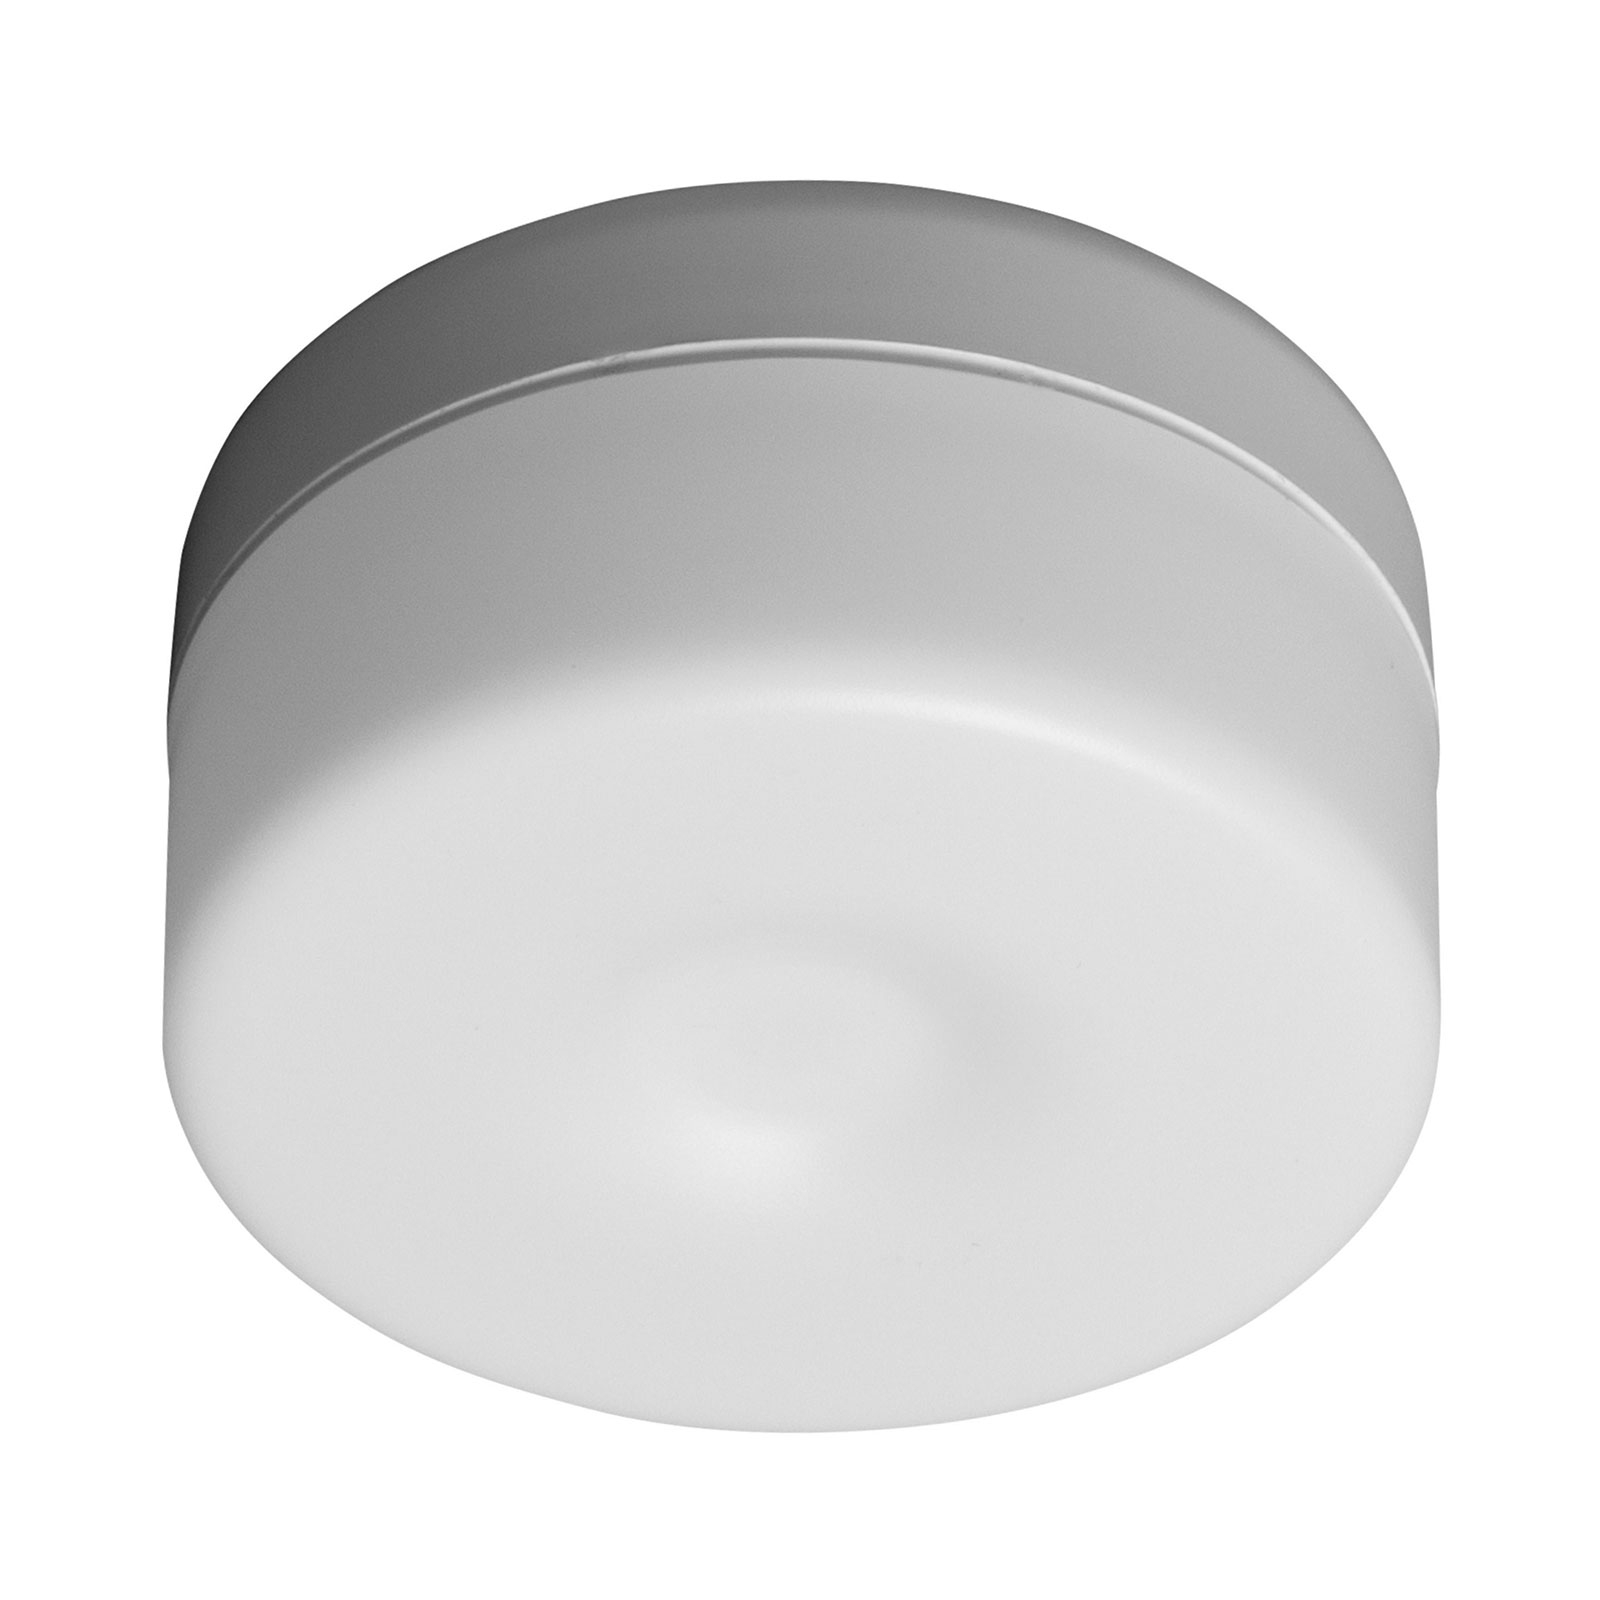 LEDVANCE DOT-it Touch High -kalustevalaisin